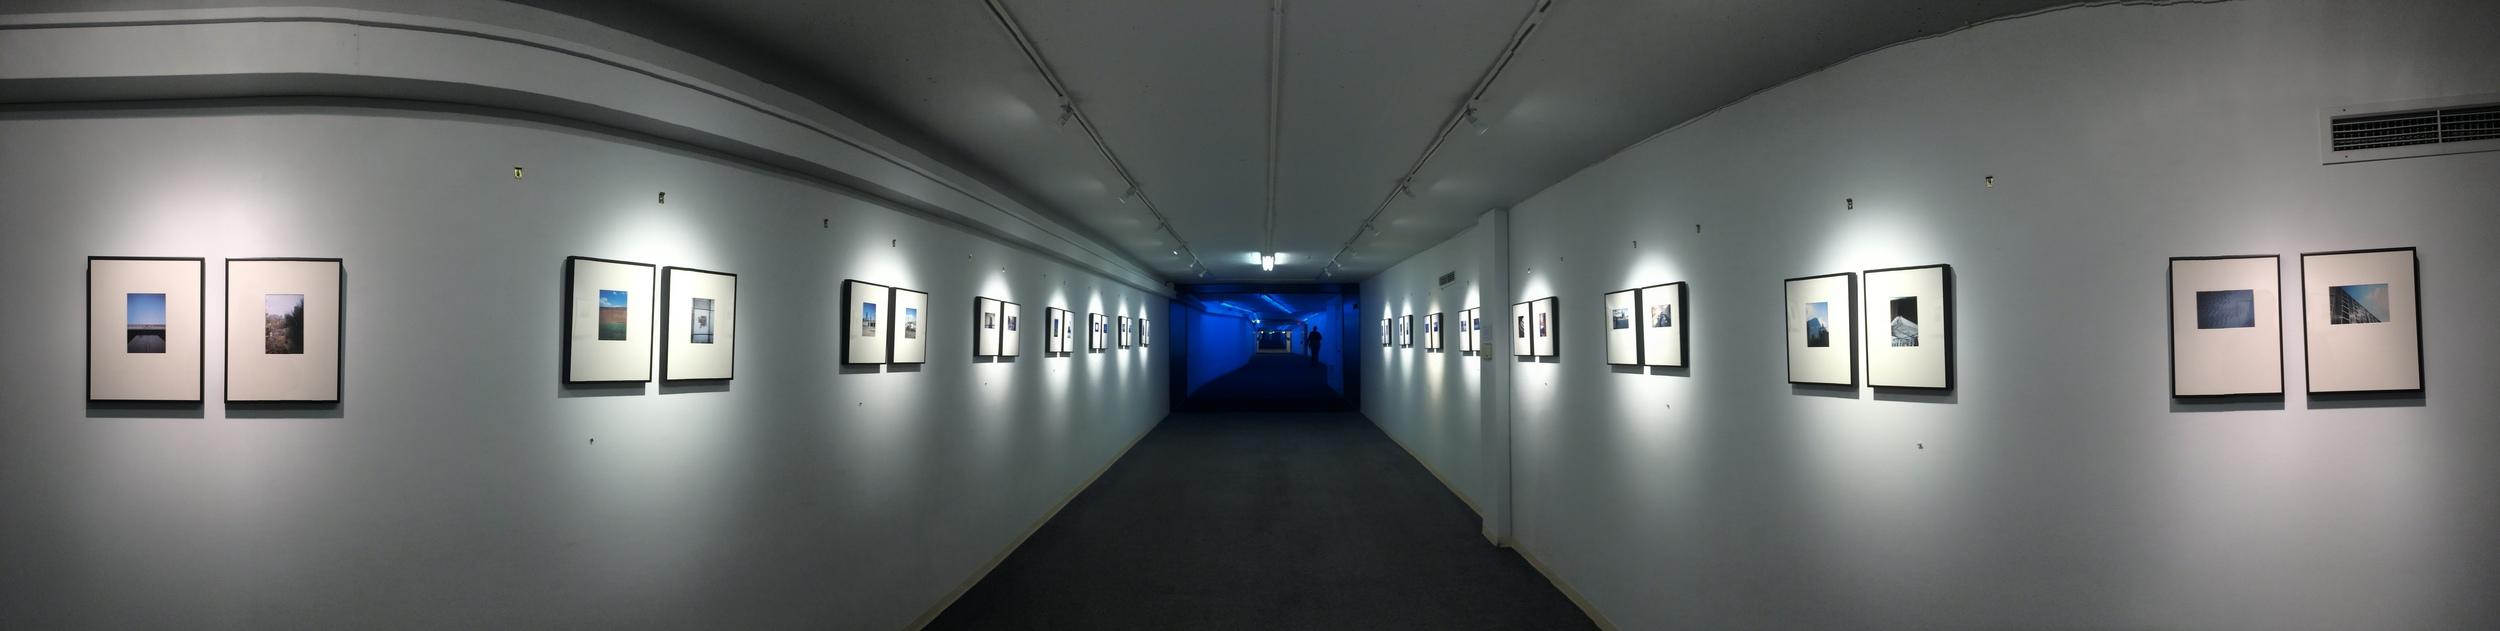 panorama style